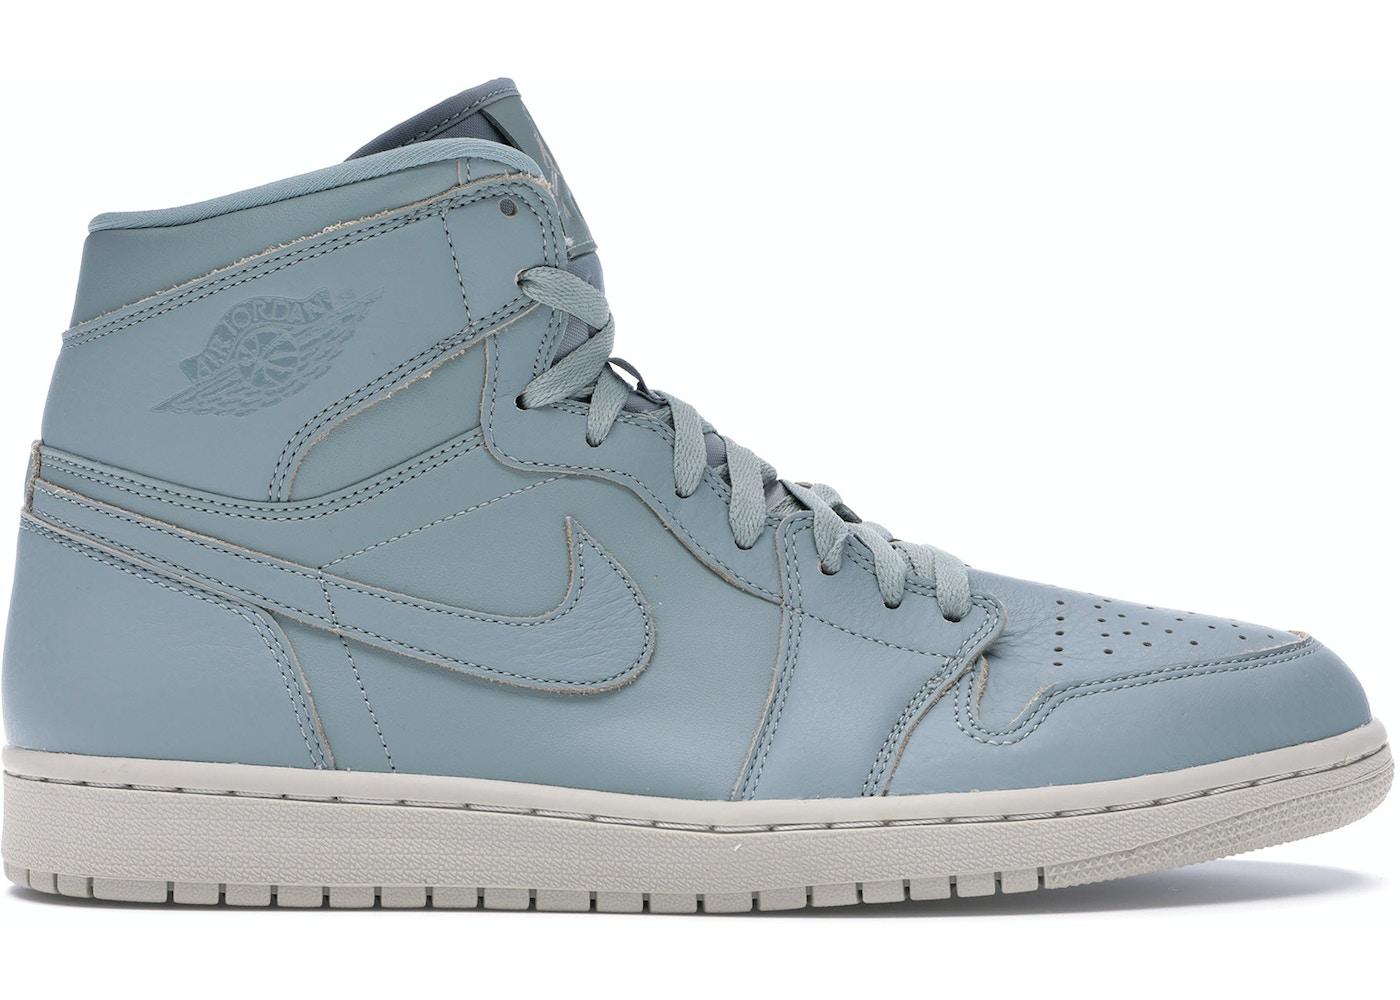 f2a2aa797831 Air Jordan 1 Size 9 Shoes - Volatility